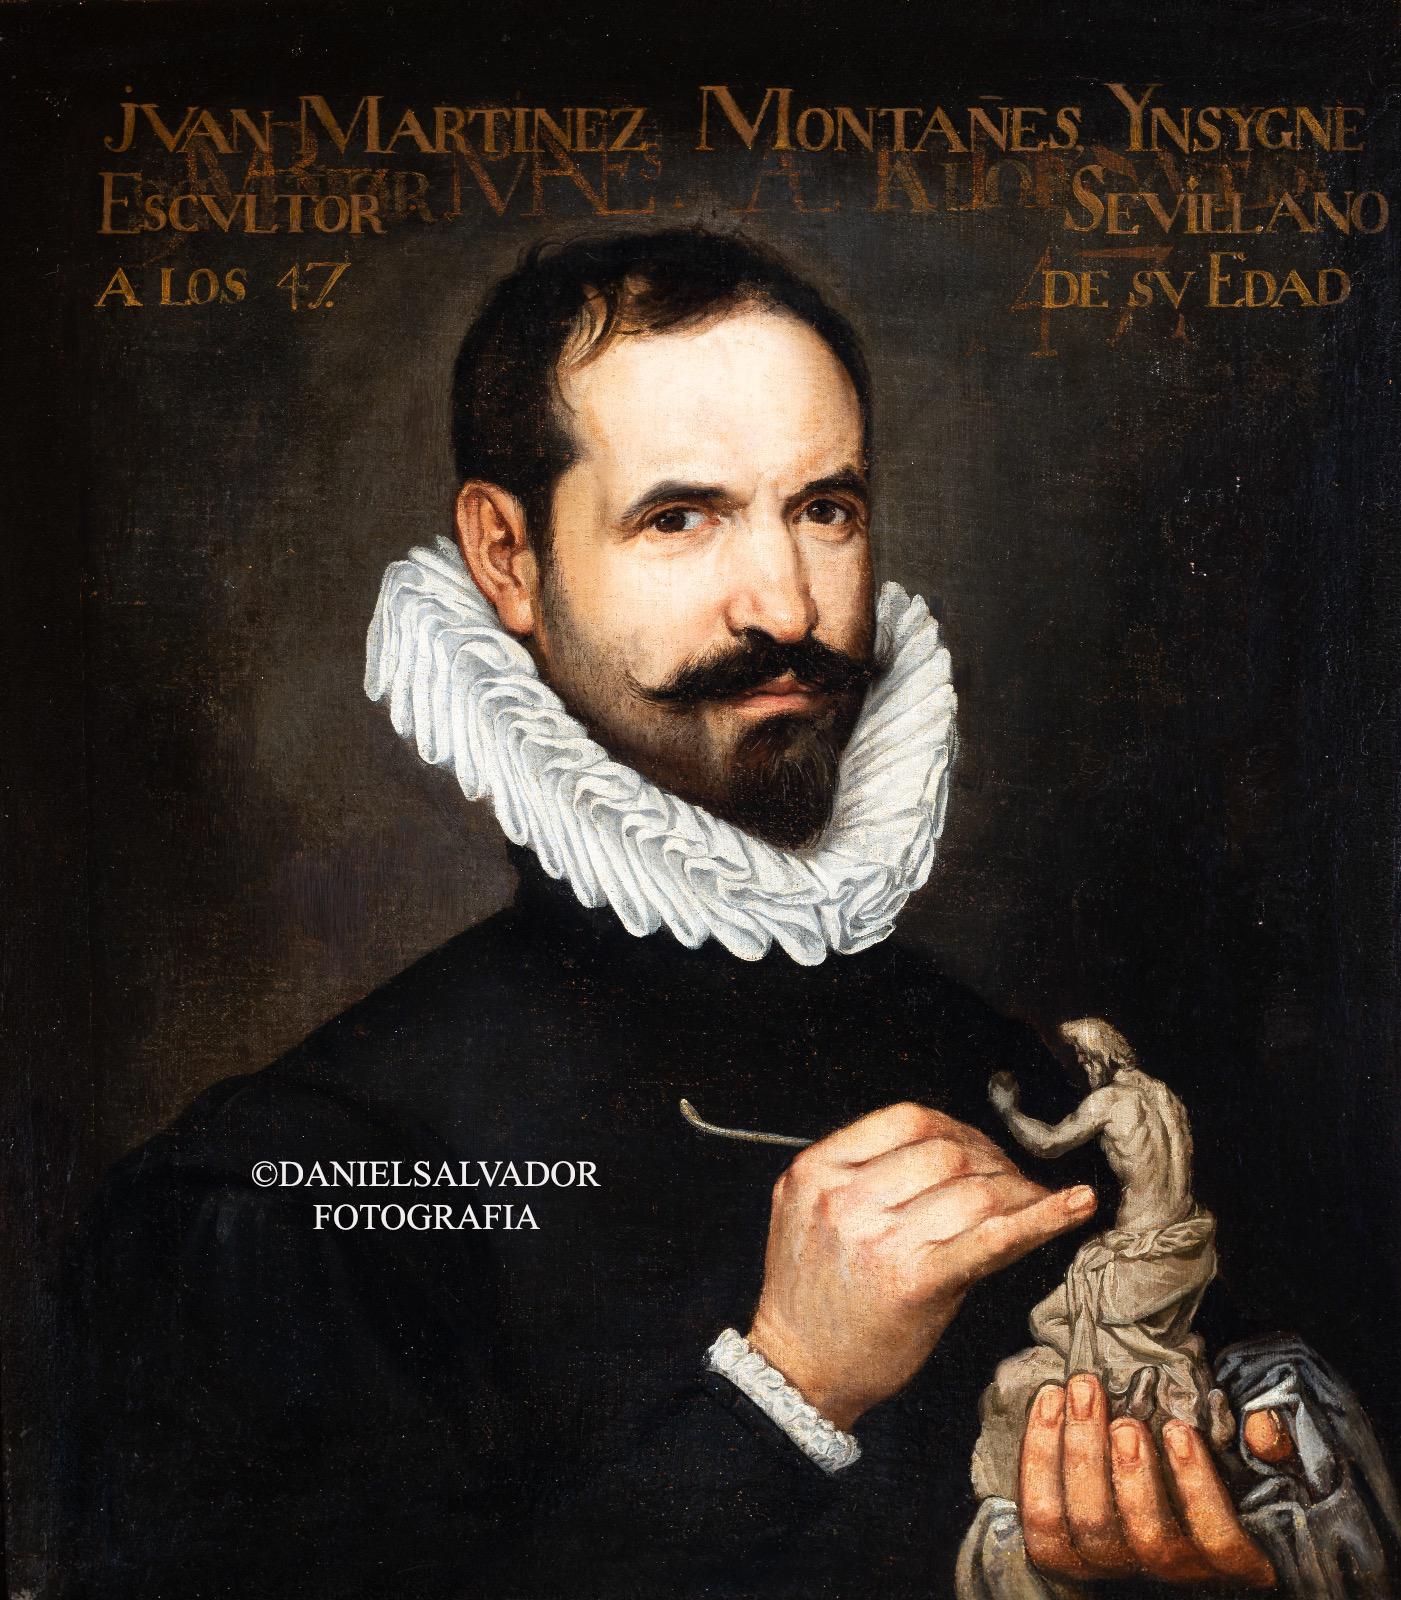 Retrato de Juan Martínez Montañés. Francisco Varela